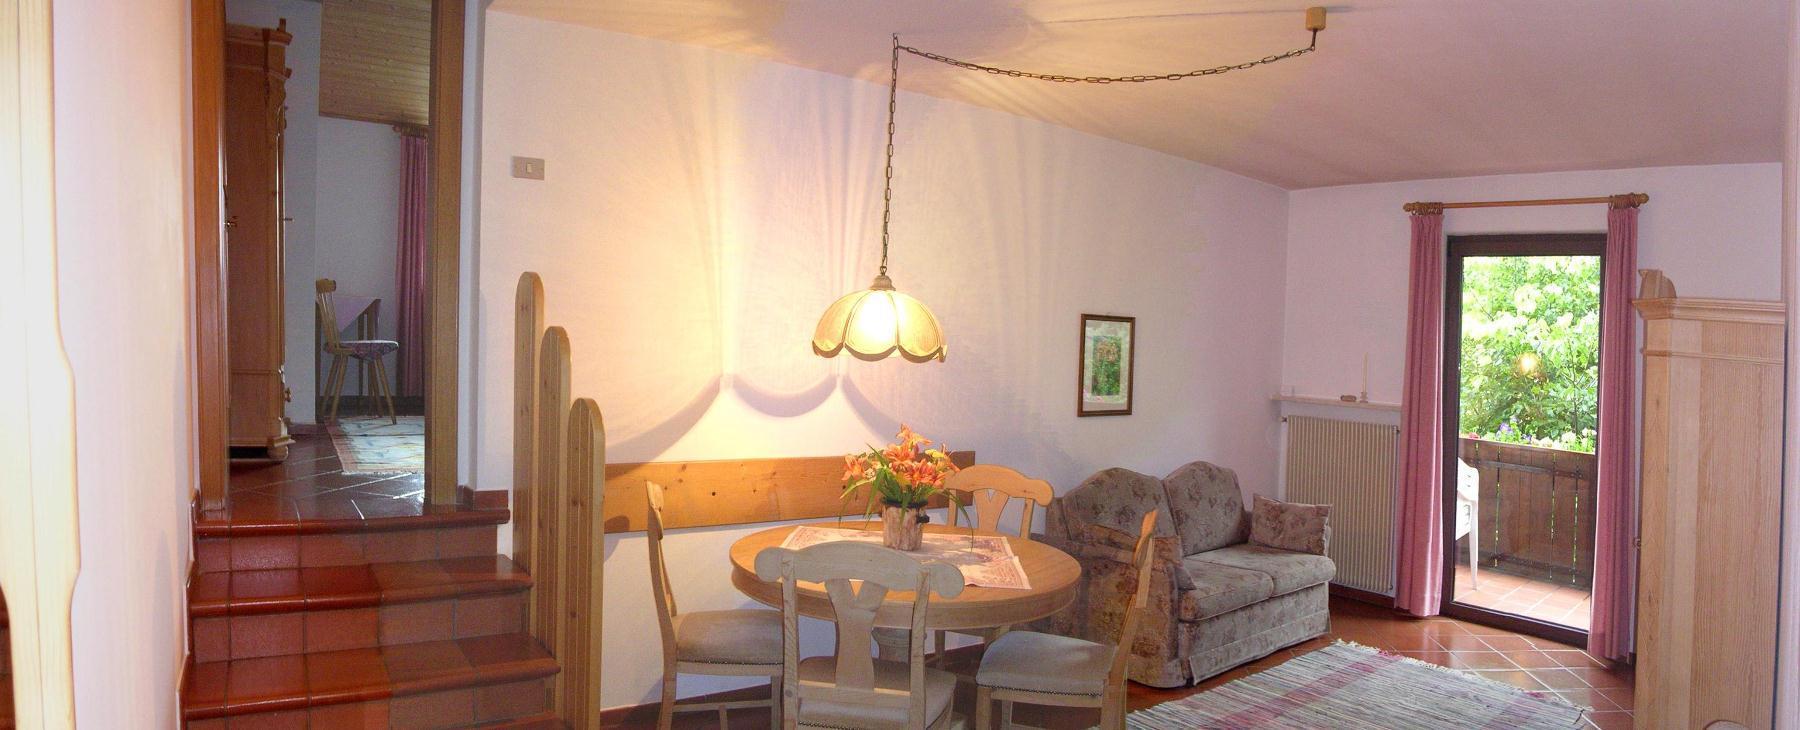 Residence Gritschhof - 3